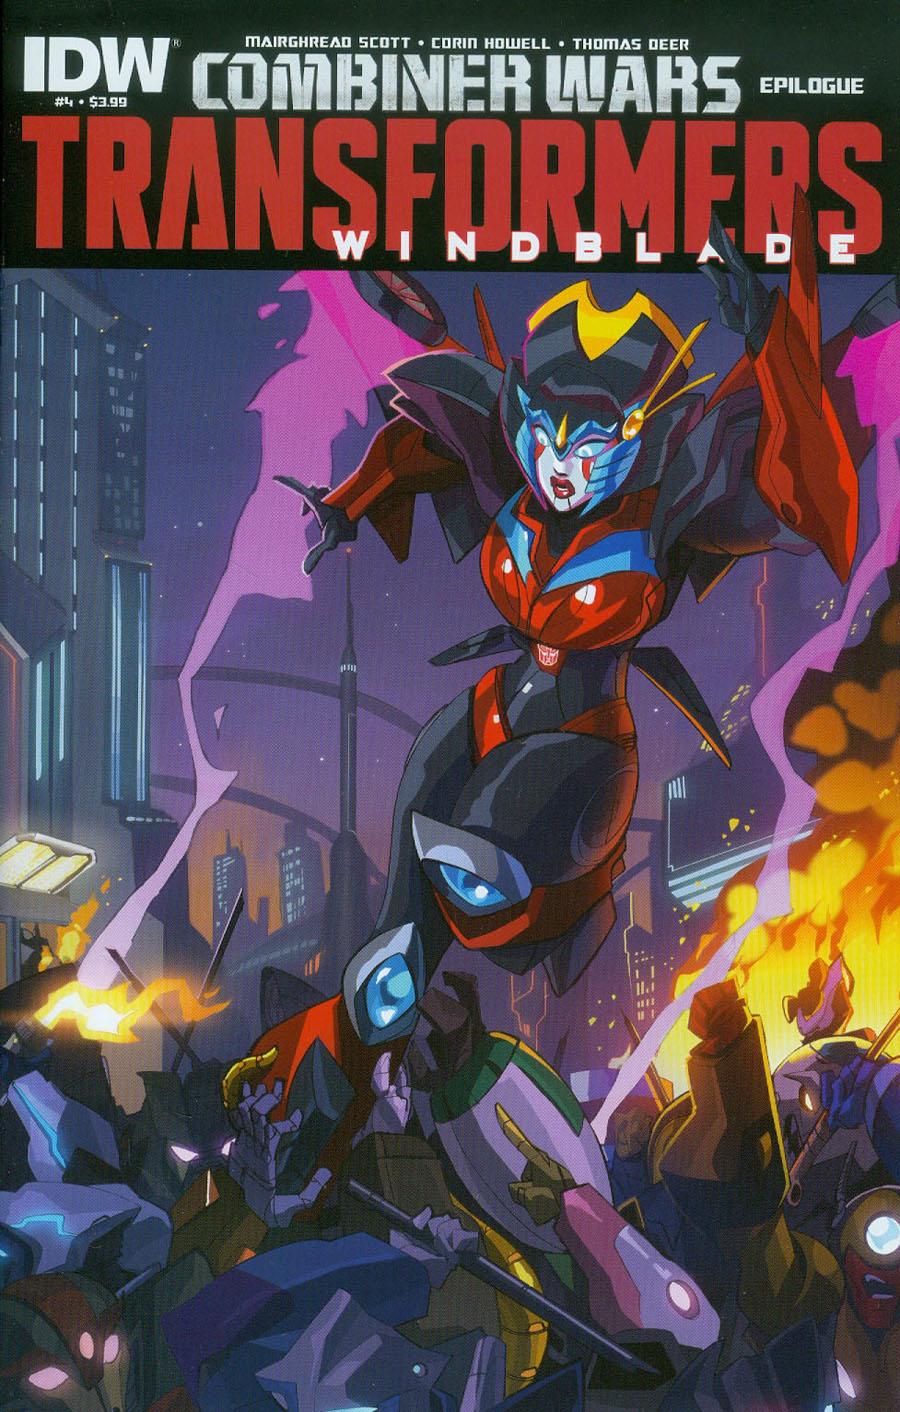 Transformers Windblade Combiner Wars #4 Cover A Regular Priscilla Tramontano Cover (Combiner Wars Epilogue)